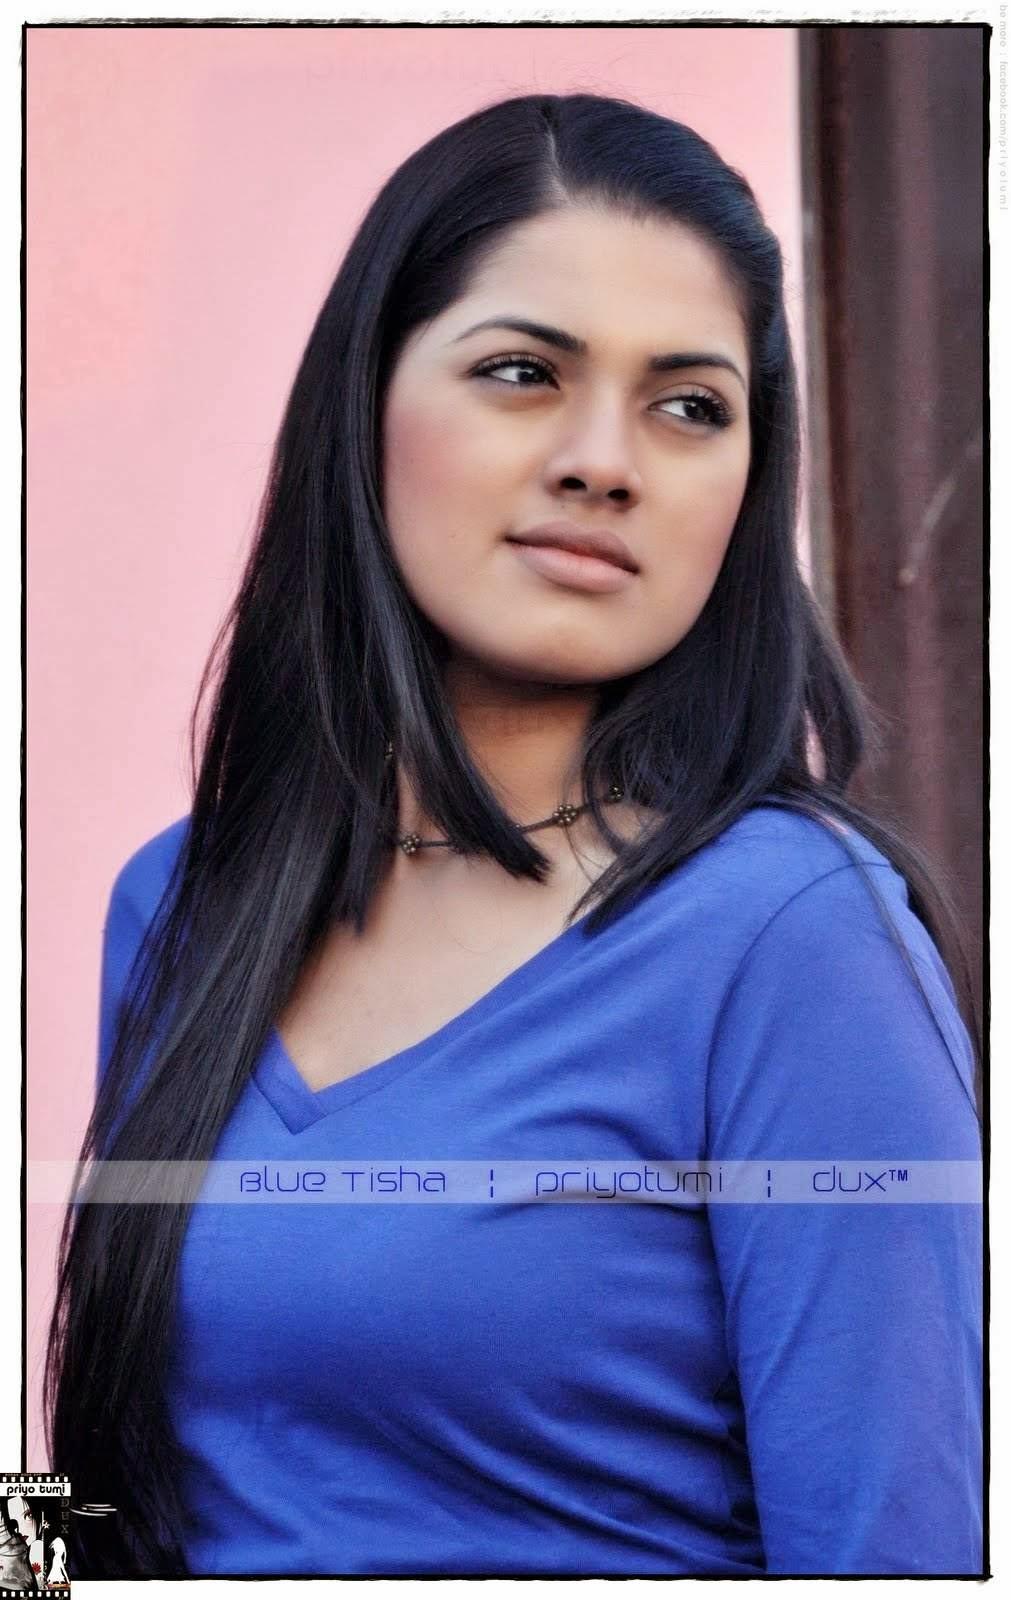 Nusrat Imroz Tisha Bd Model Hot  Sexy Wallpaper Picture -9578